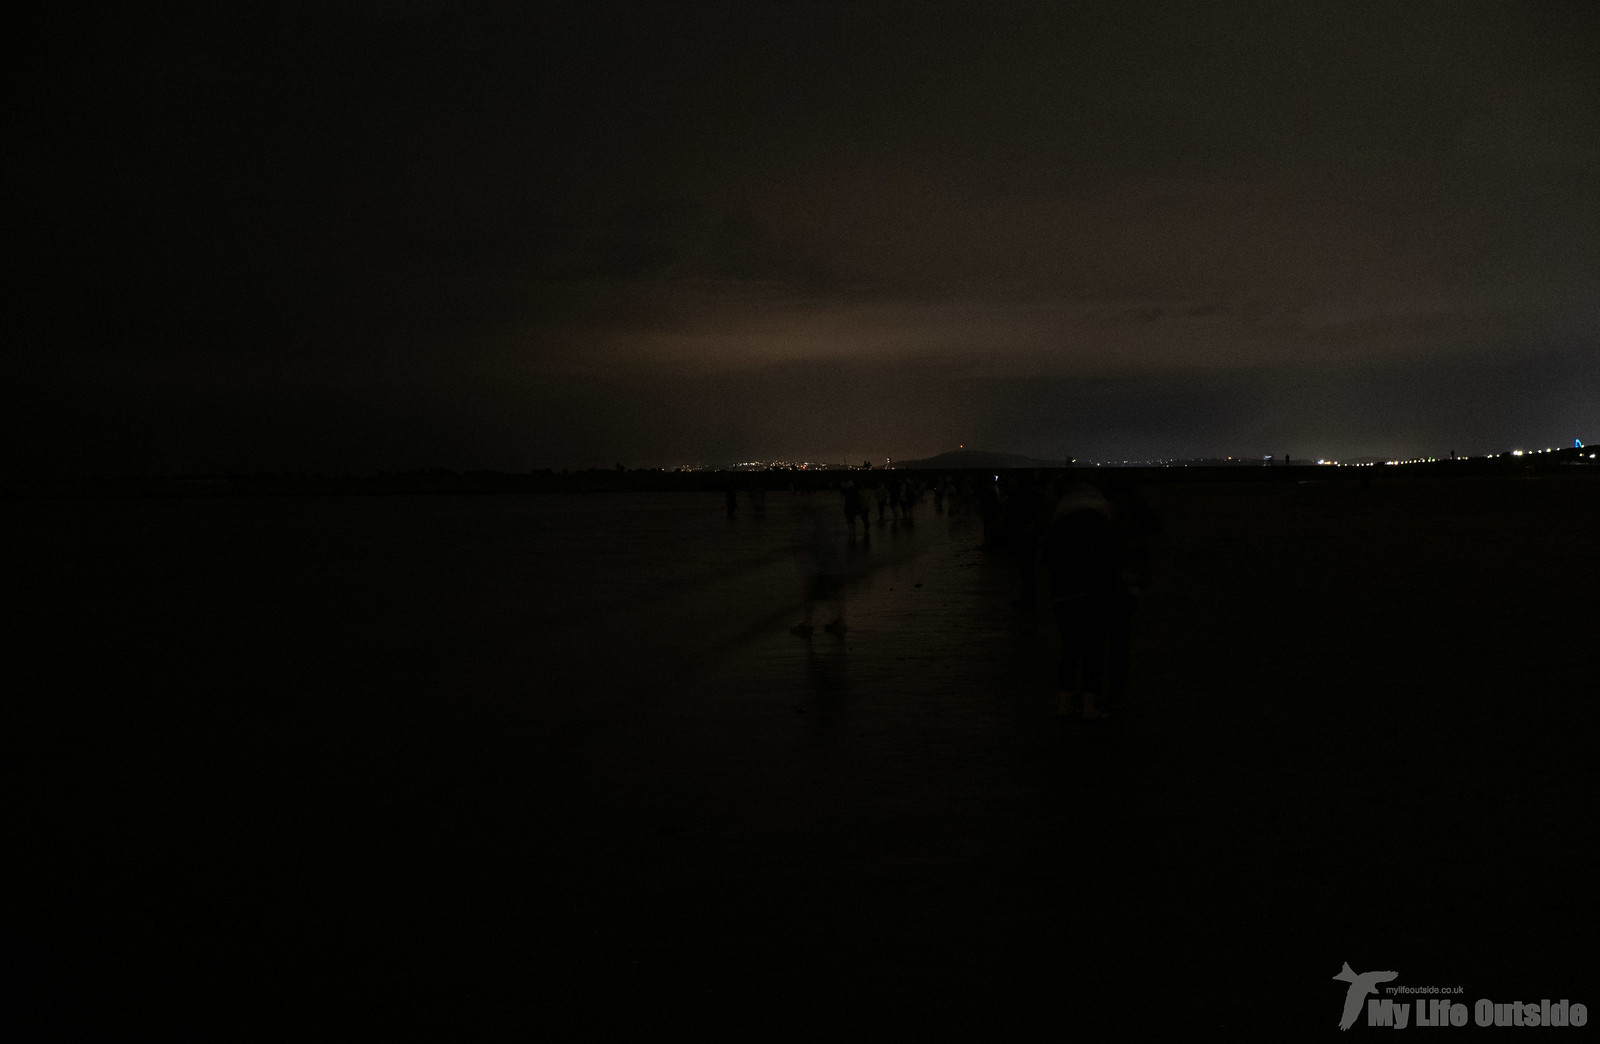 P7013460 - Bioluminescent Plankton, Aberavon